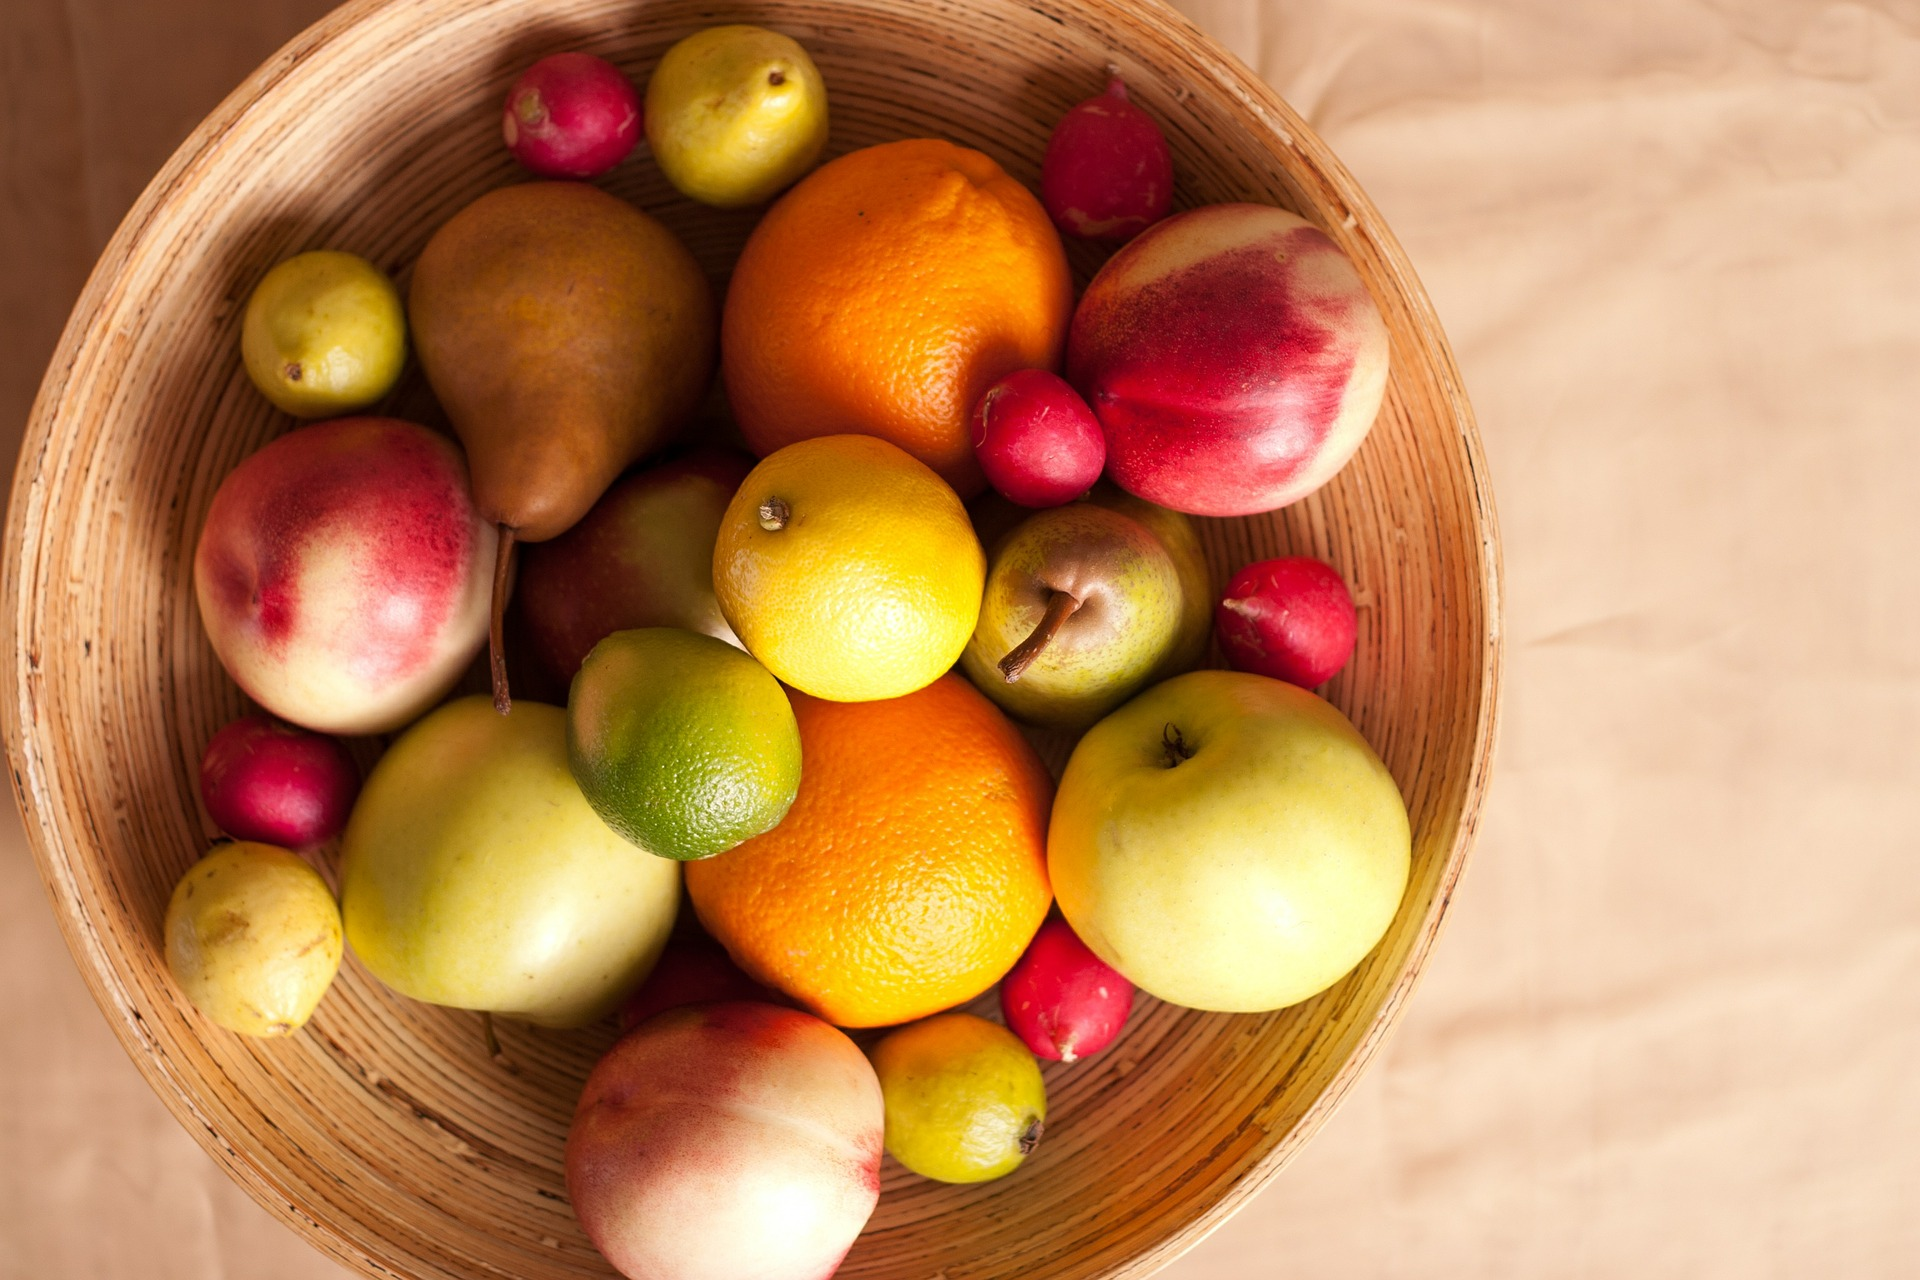 fruits-601742_1920.jpg